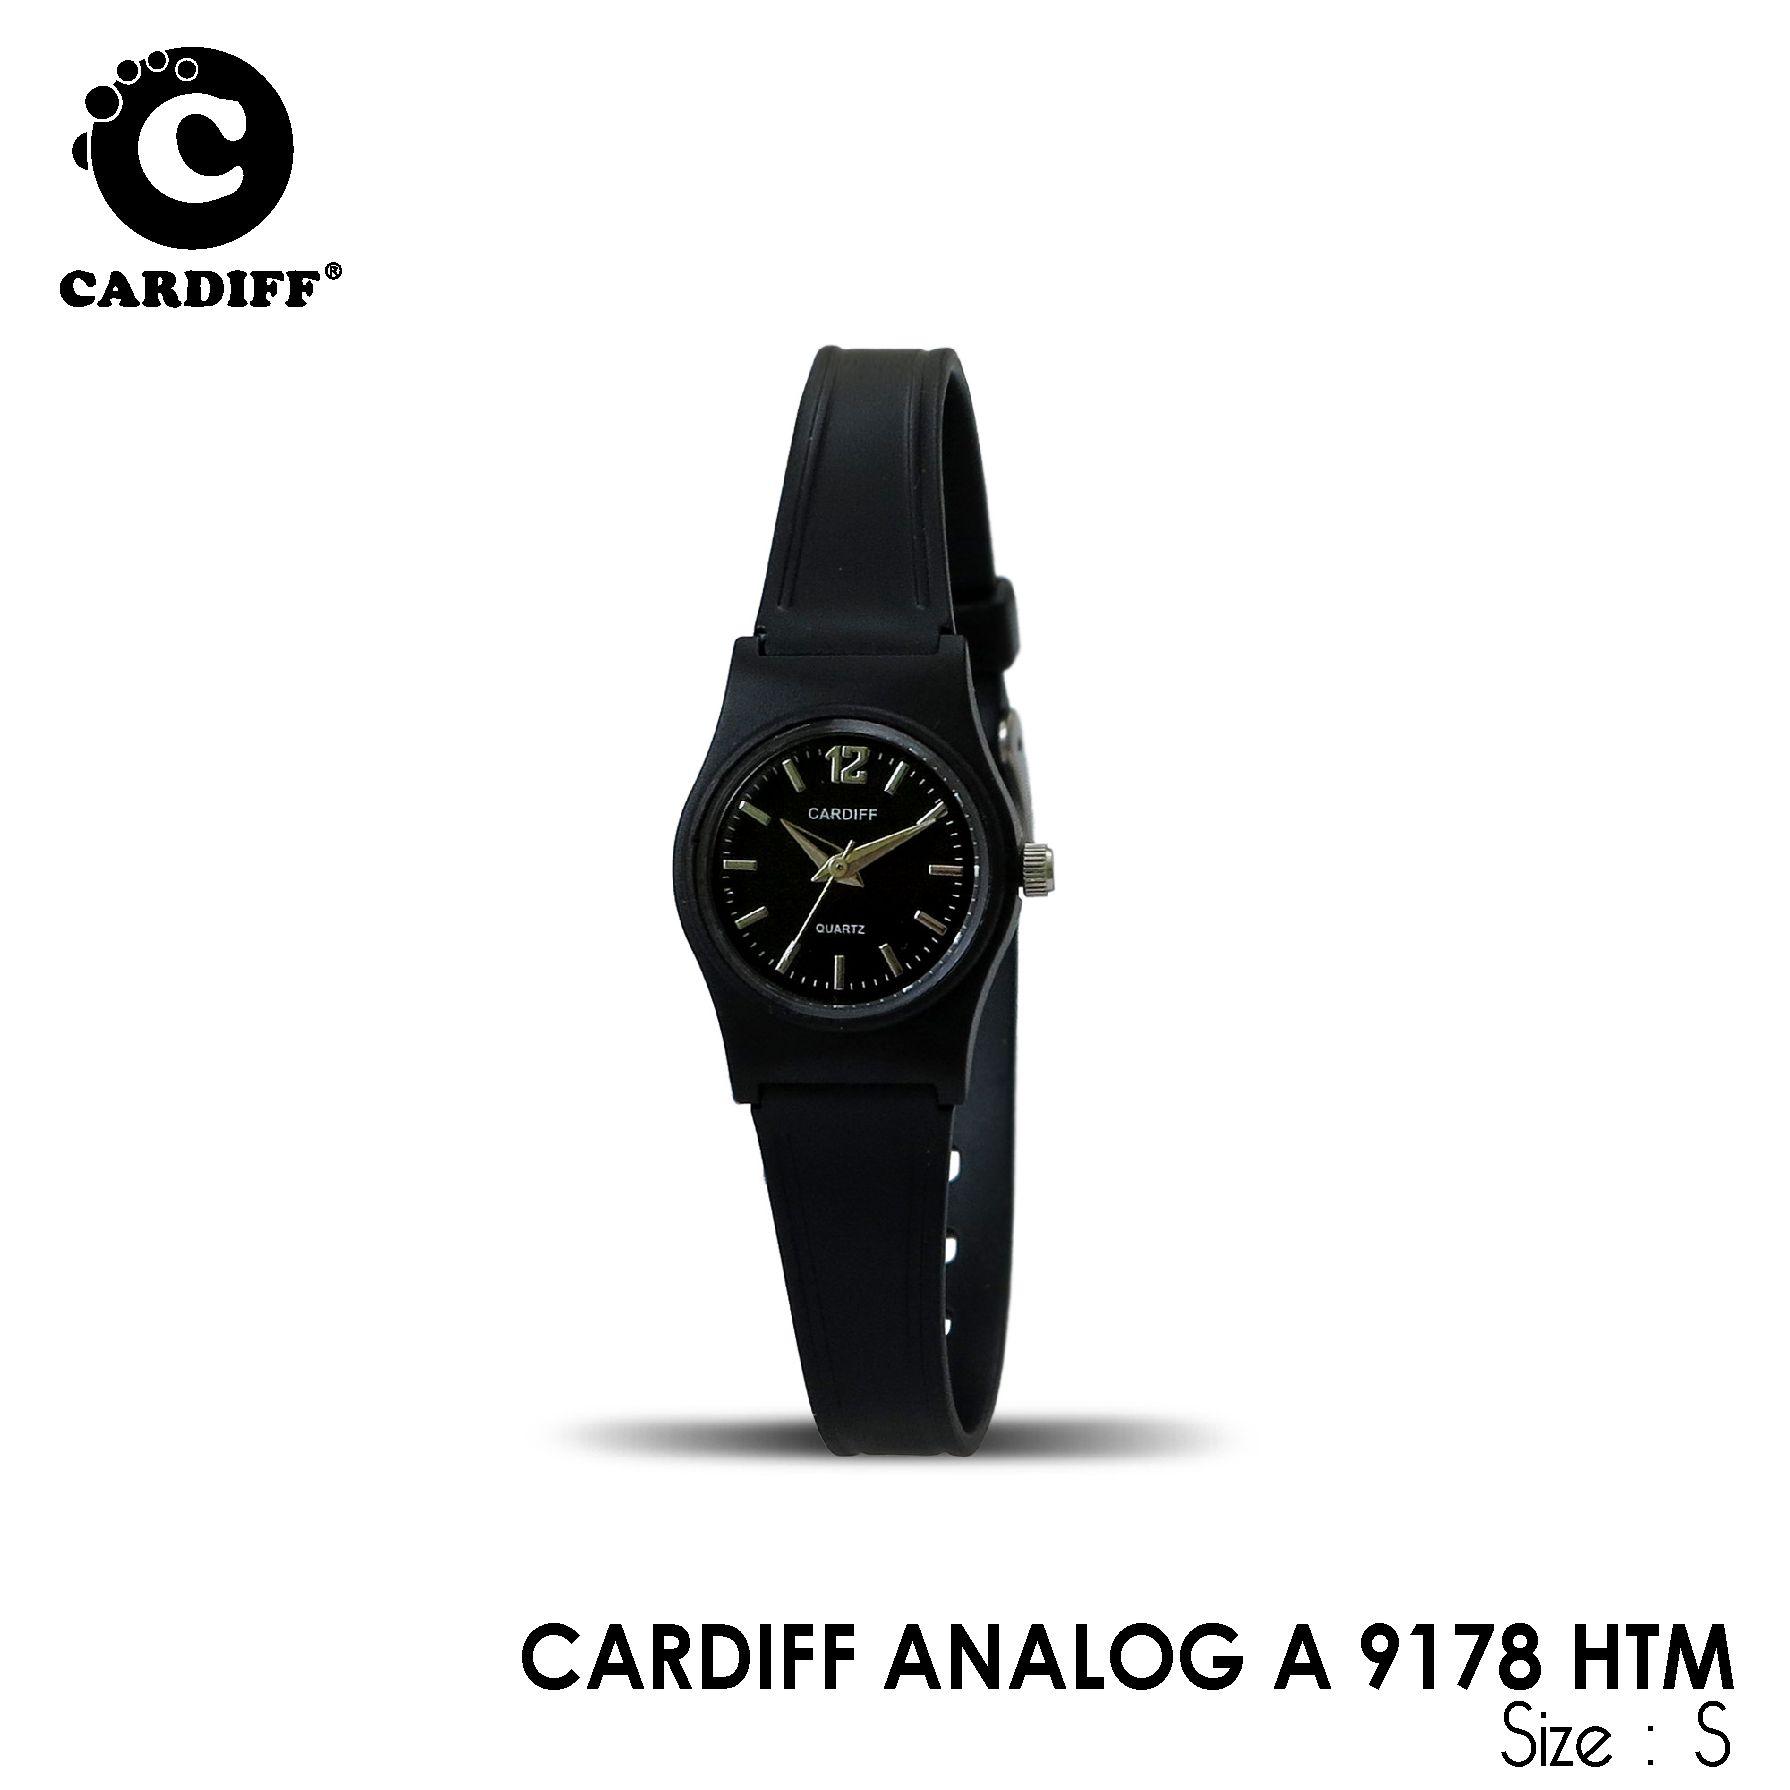 Cardiff Analog A 9178